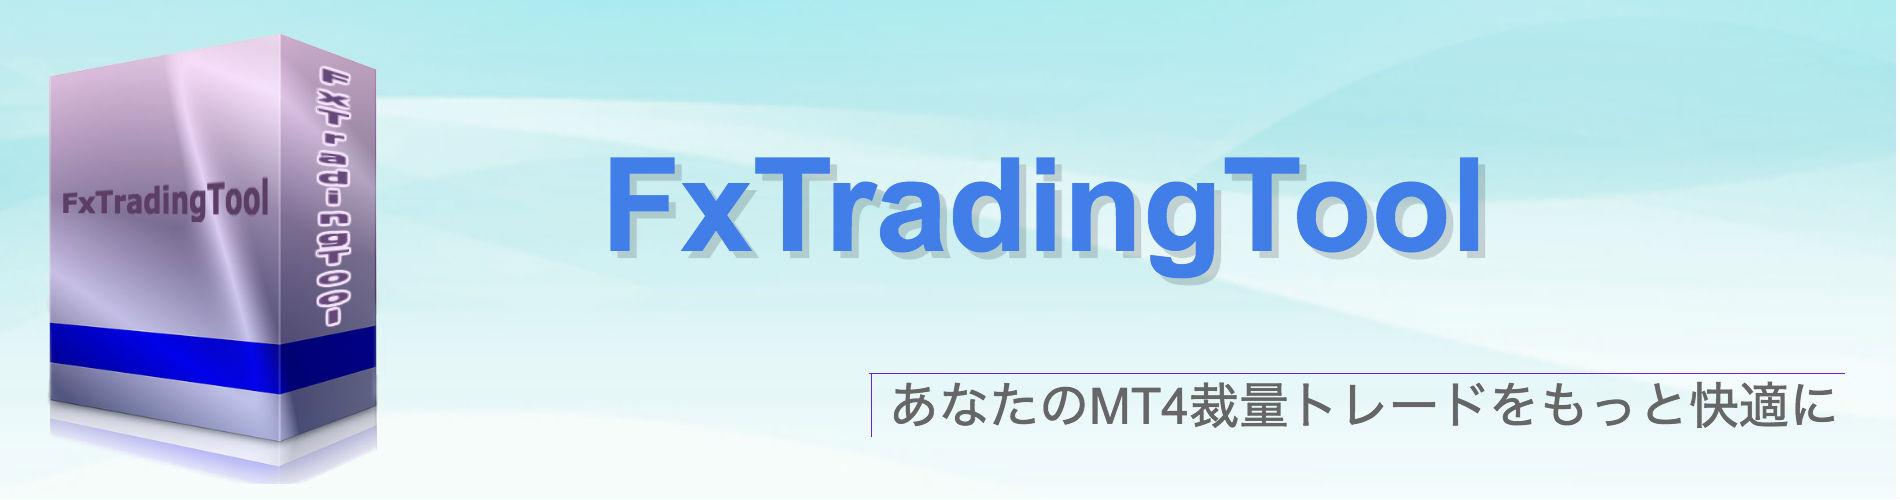 FxTradingToolスライドショー